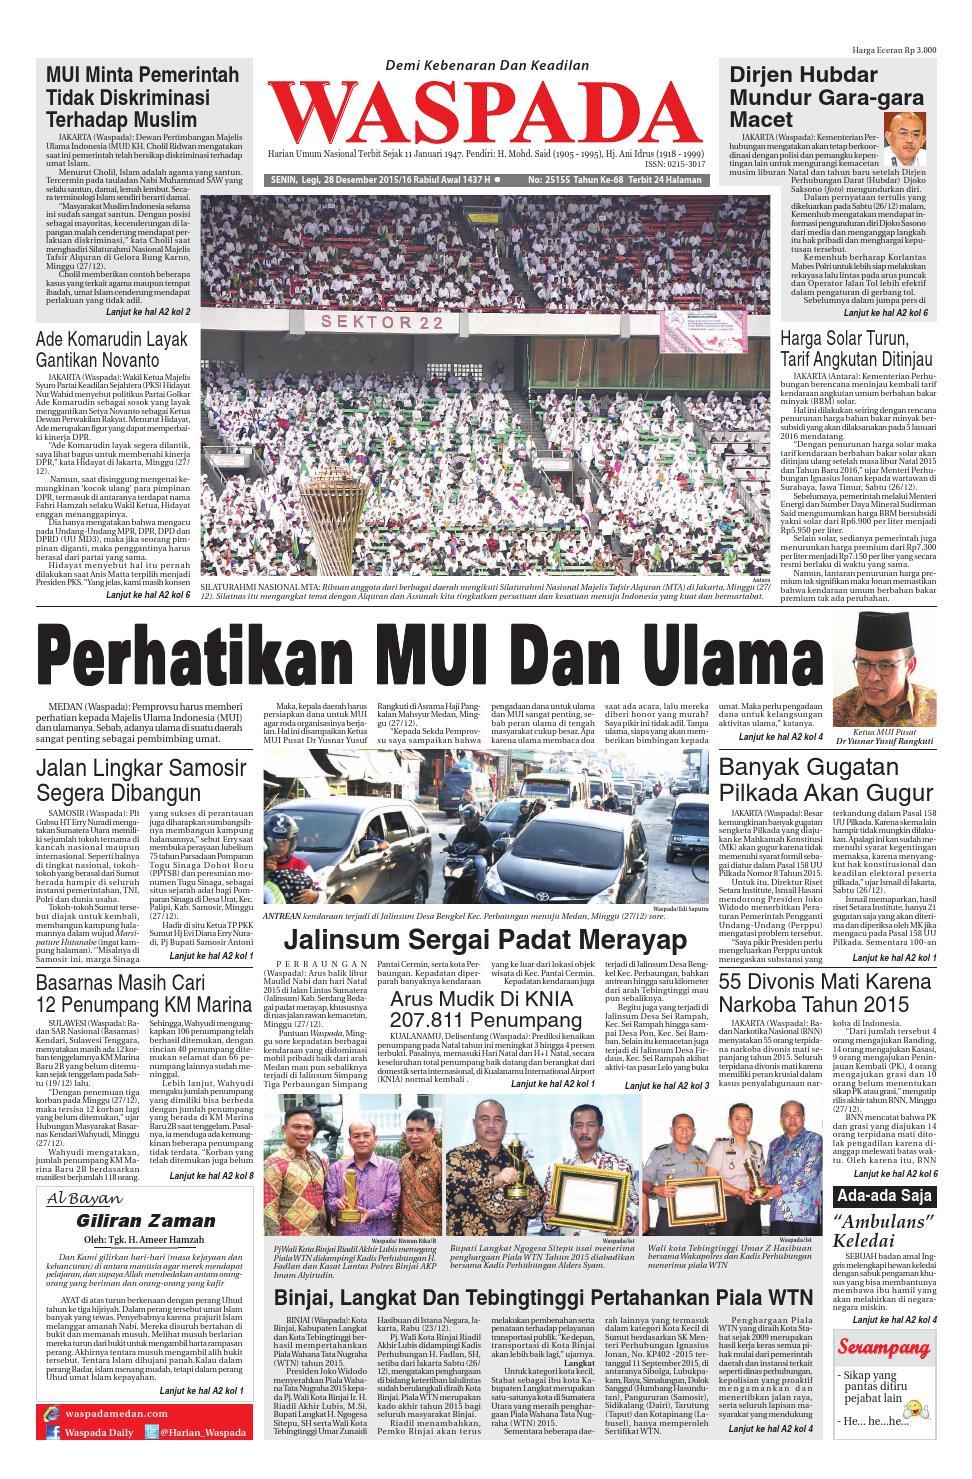 Waspada Senin 28 Desember 2015 By Harian Issuu Rkb Tegal Madu Mongso